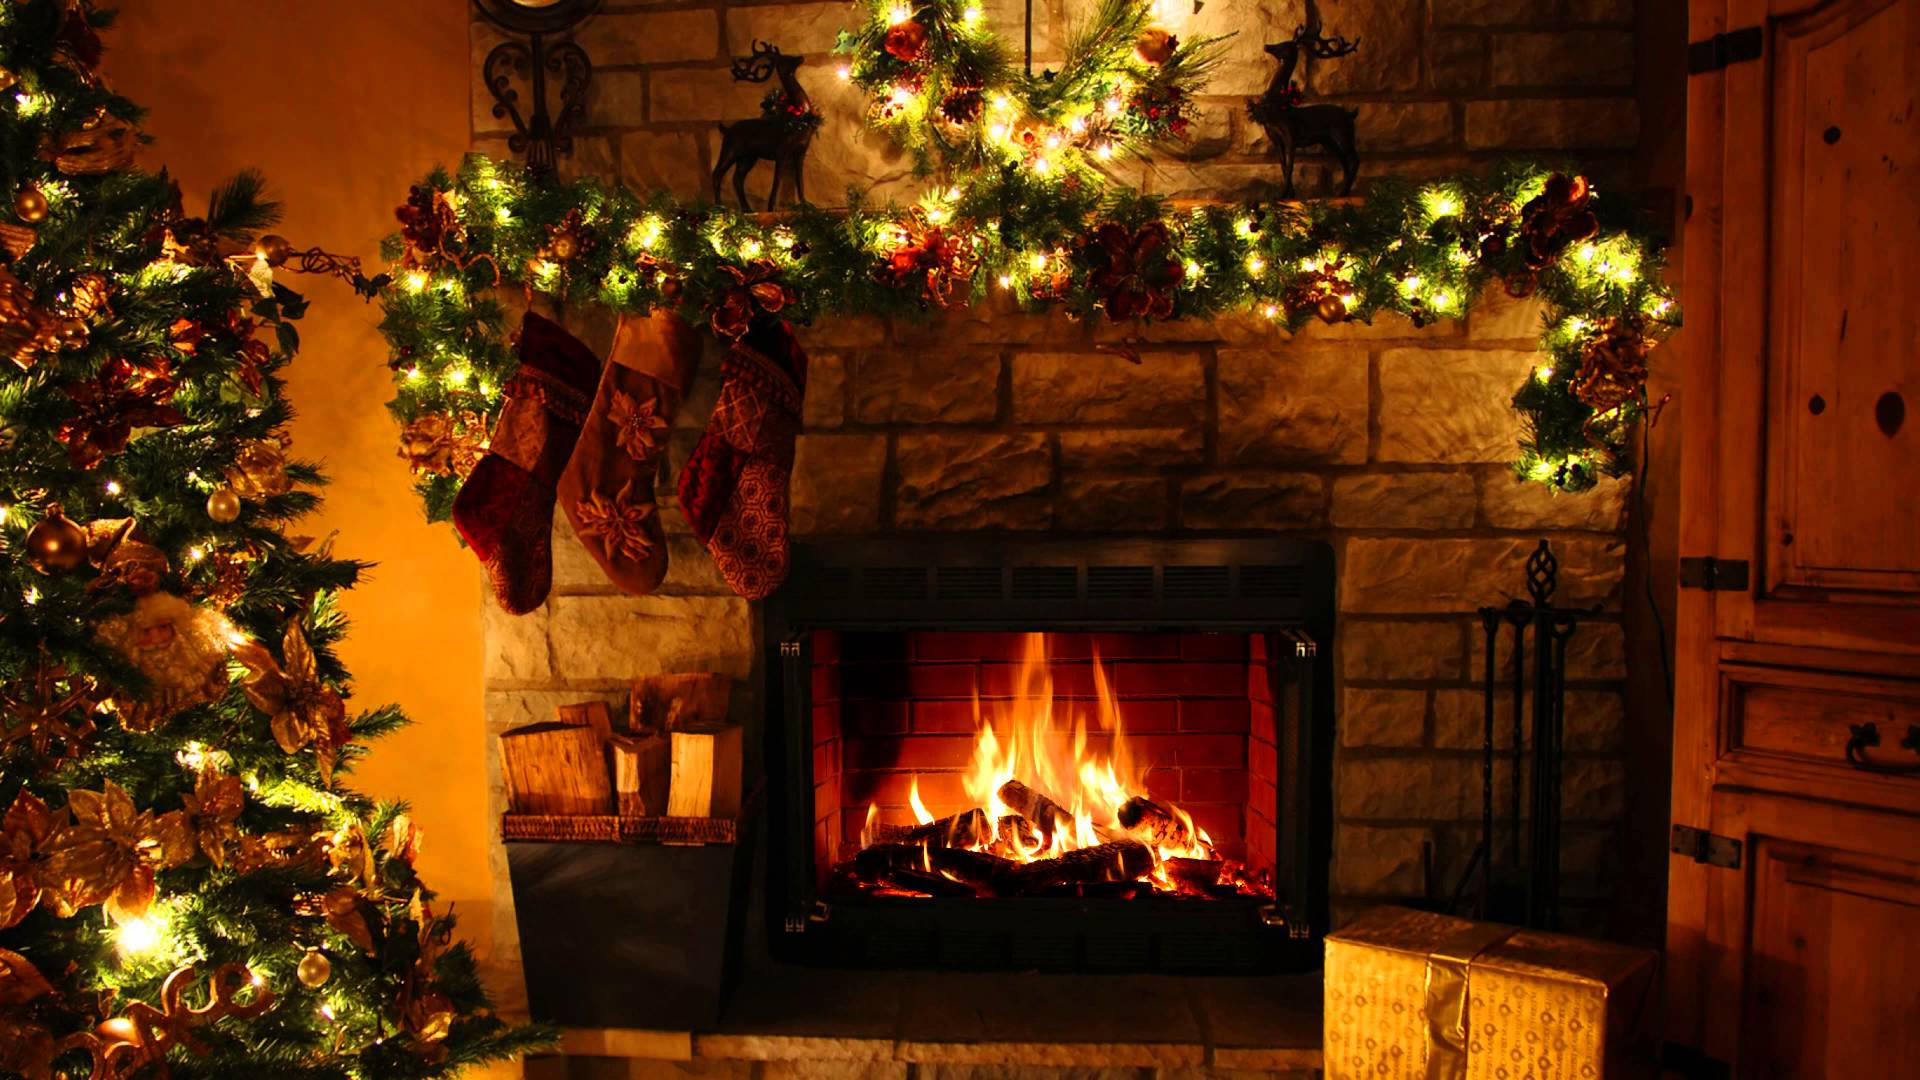 Christmas Fireplace Screensaver  decorating screensavers DriverLayer Search Engine